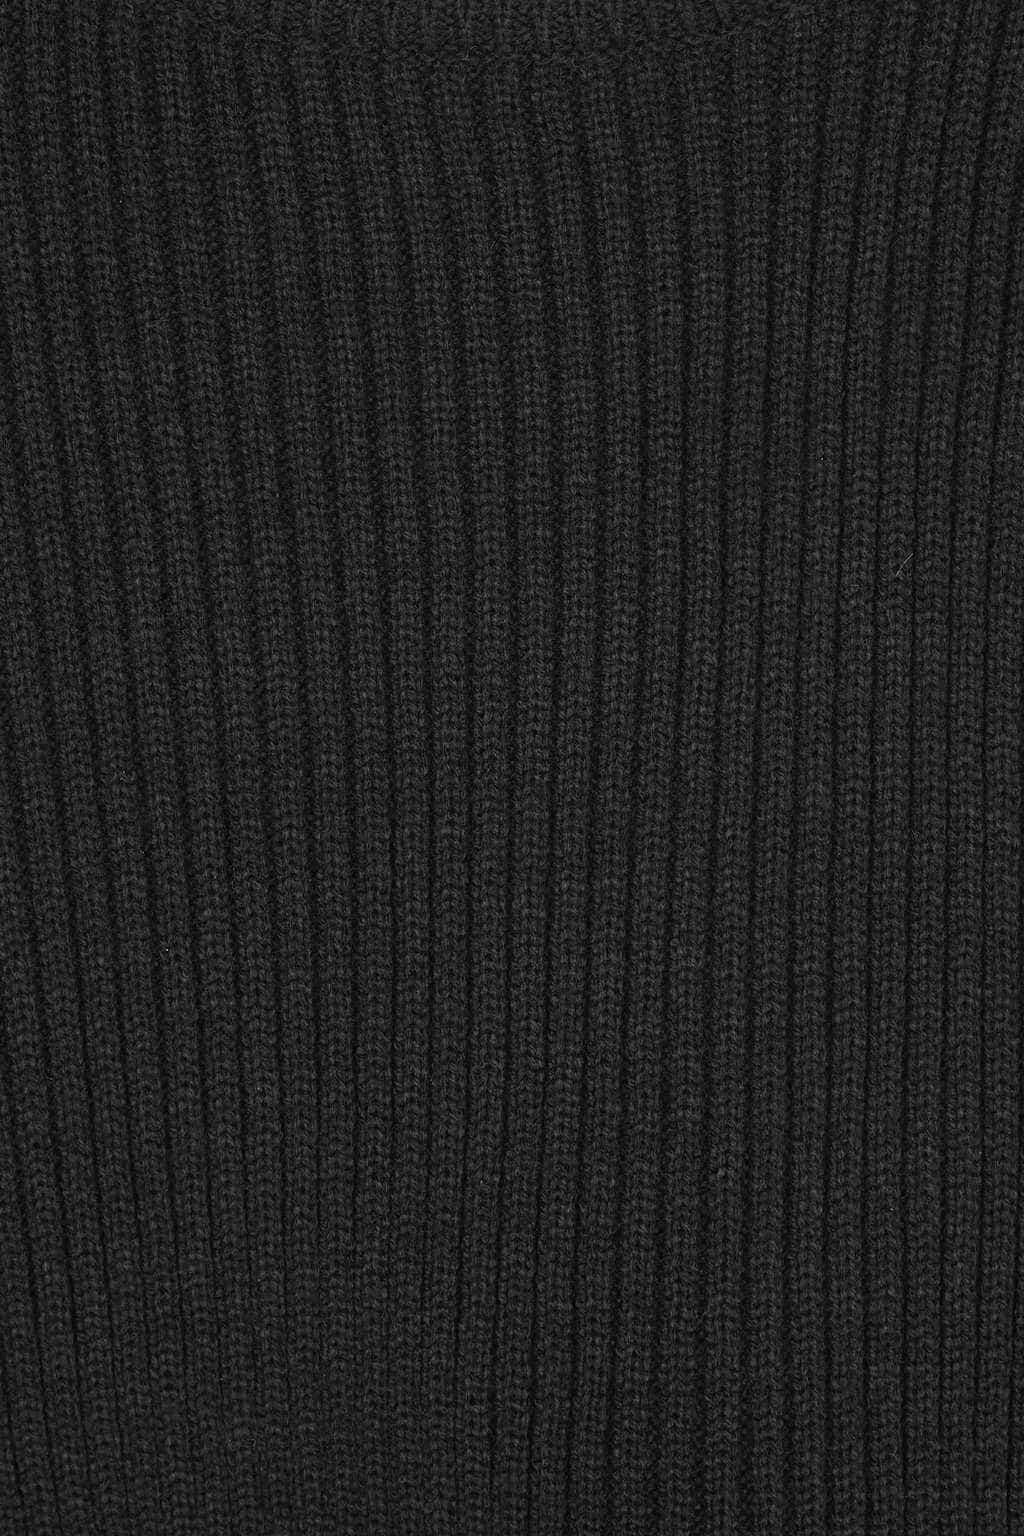 Sweater 7230 Black 8